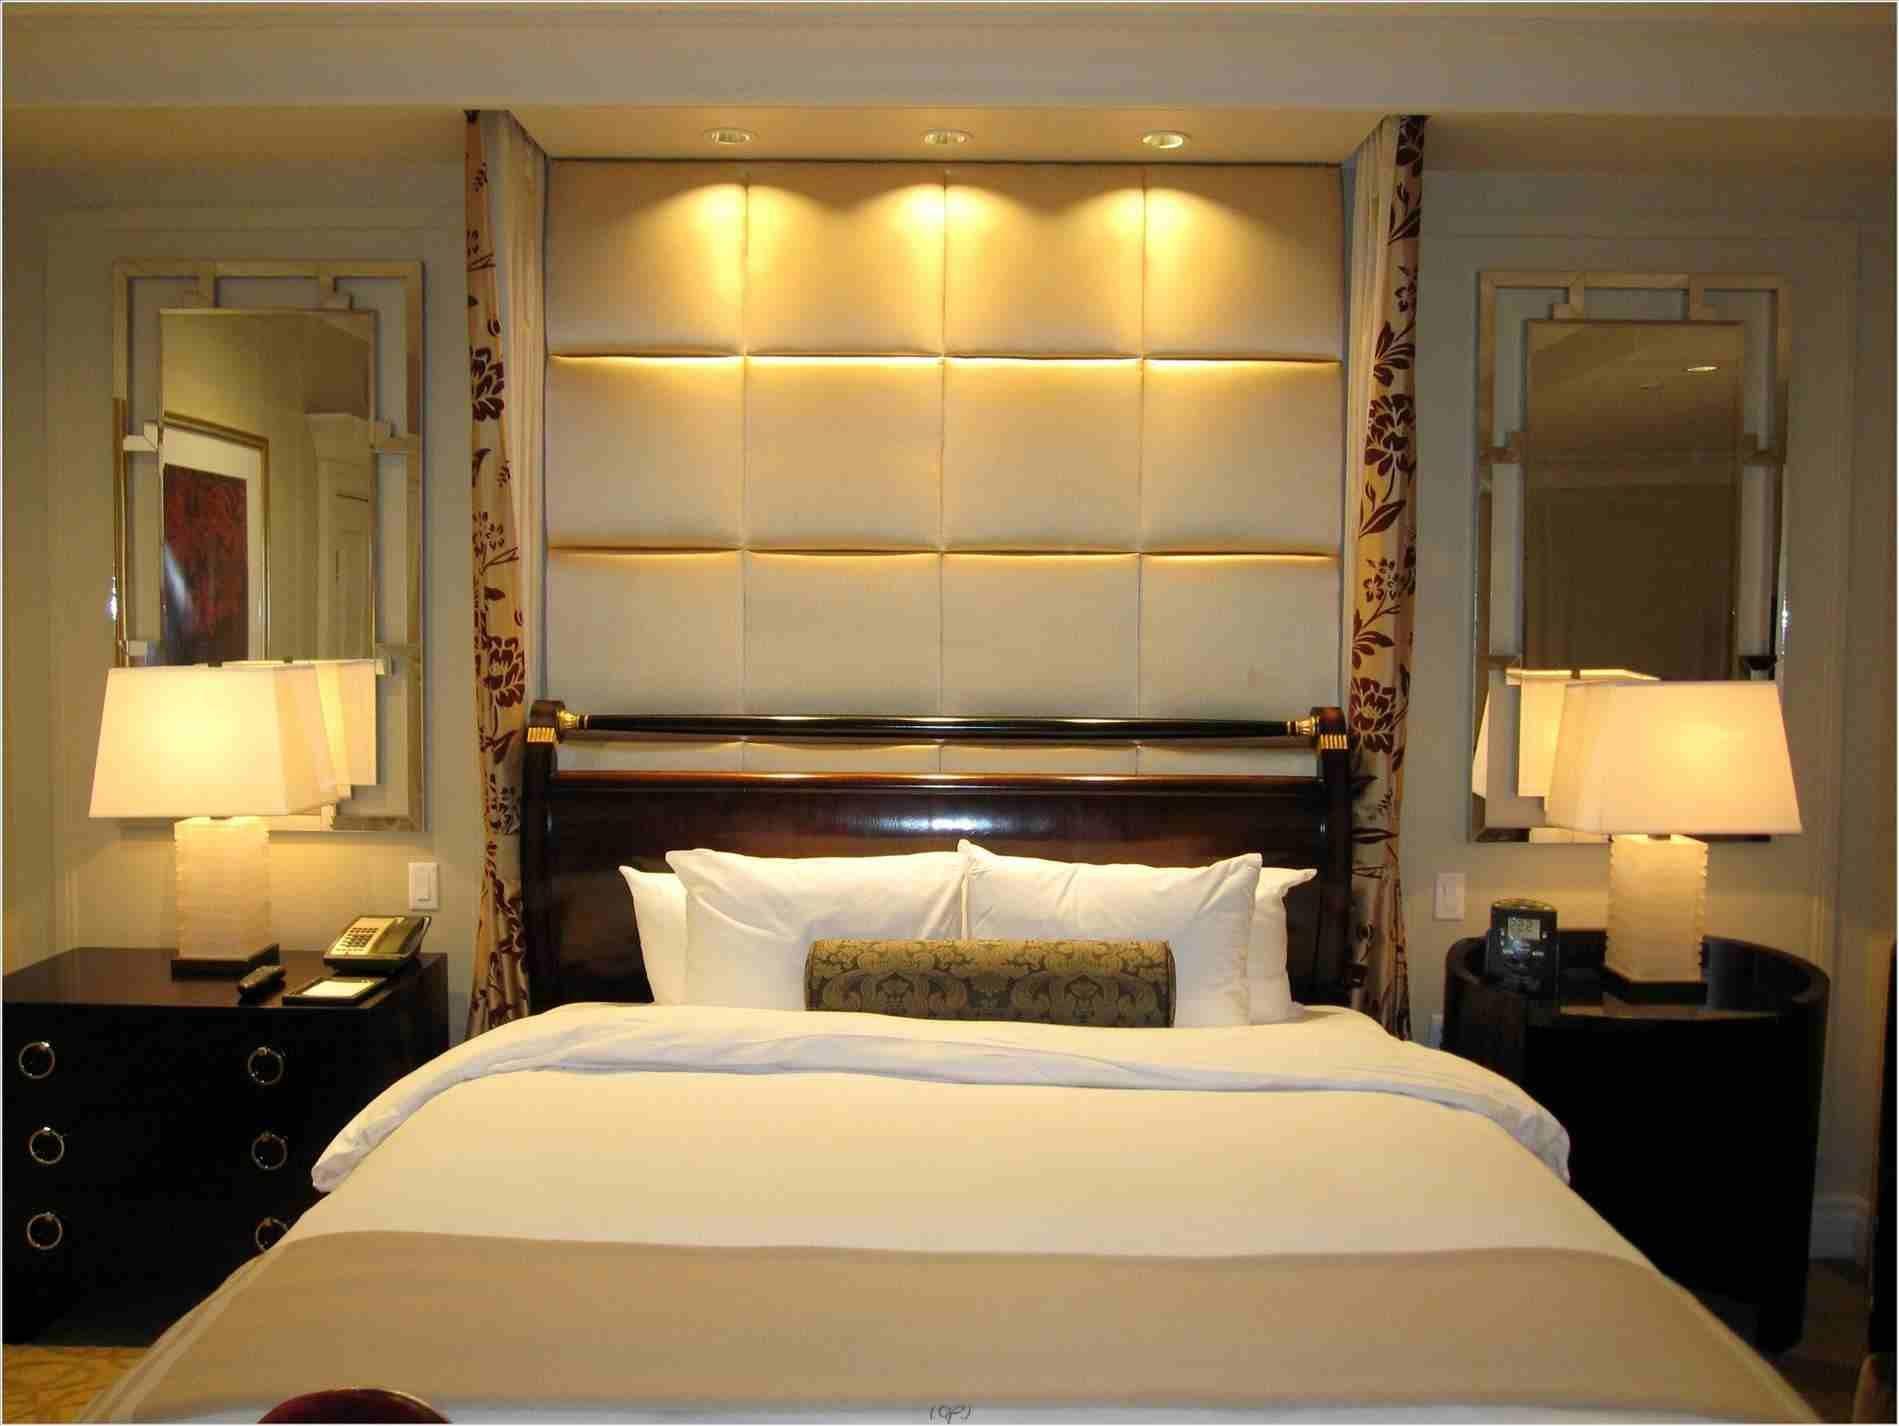 Bedroom designs in india full image for interior design also rh pinterest